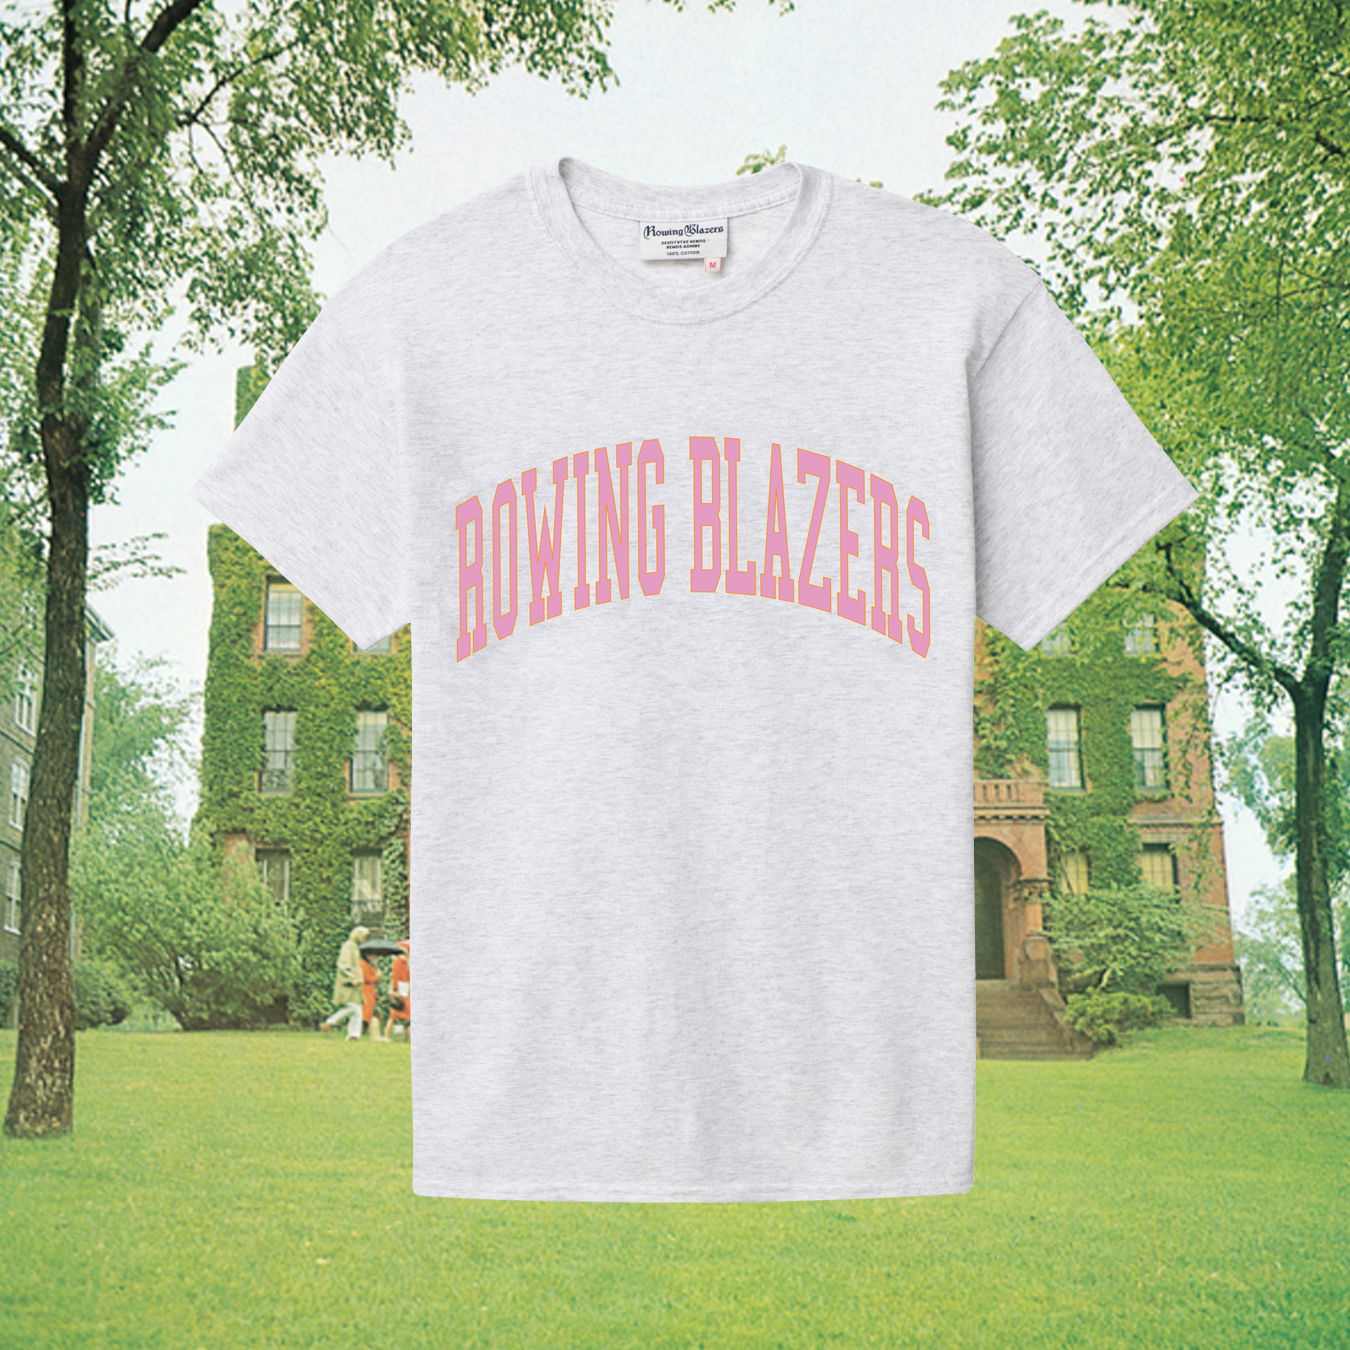 Rowing Blazers: Shop New Collegiate Tee Colors   Milled